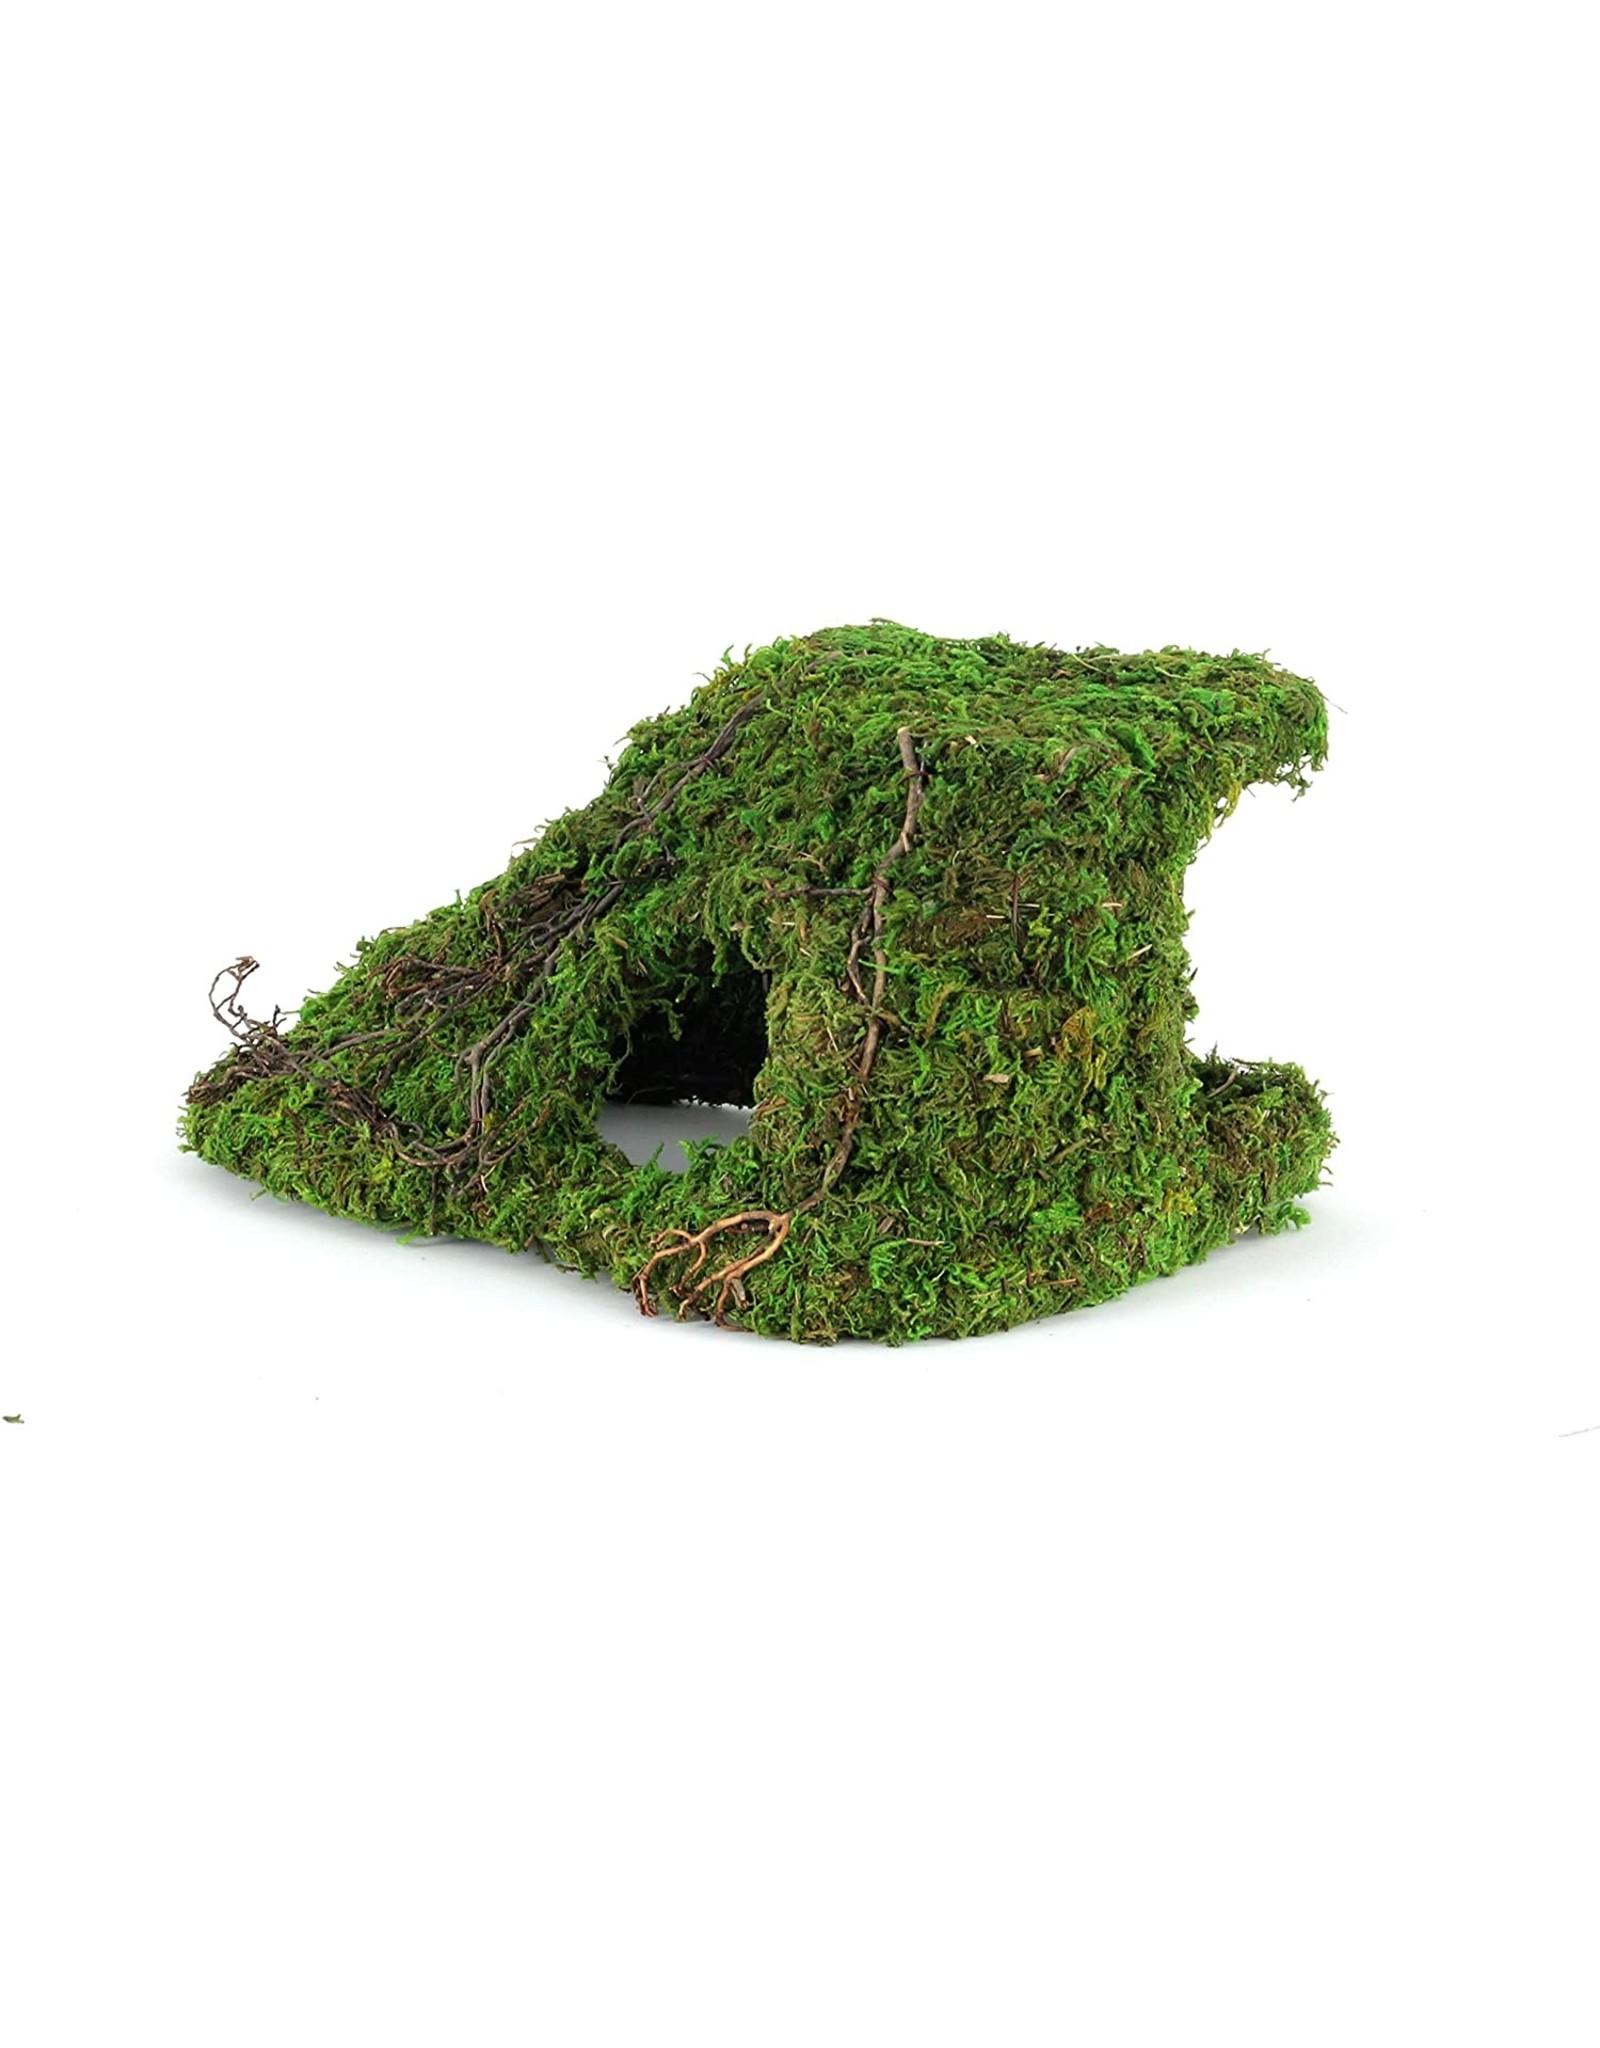 "Galapagos GALAPAGOS Mossy Corner Hide Green 10""x5.5"""